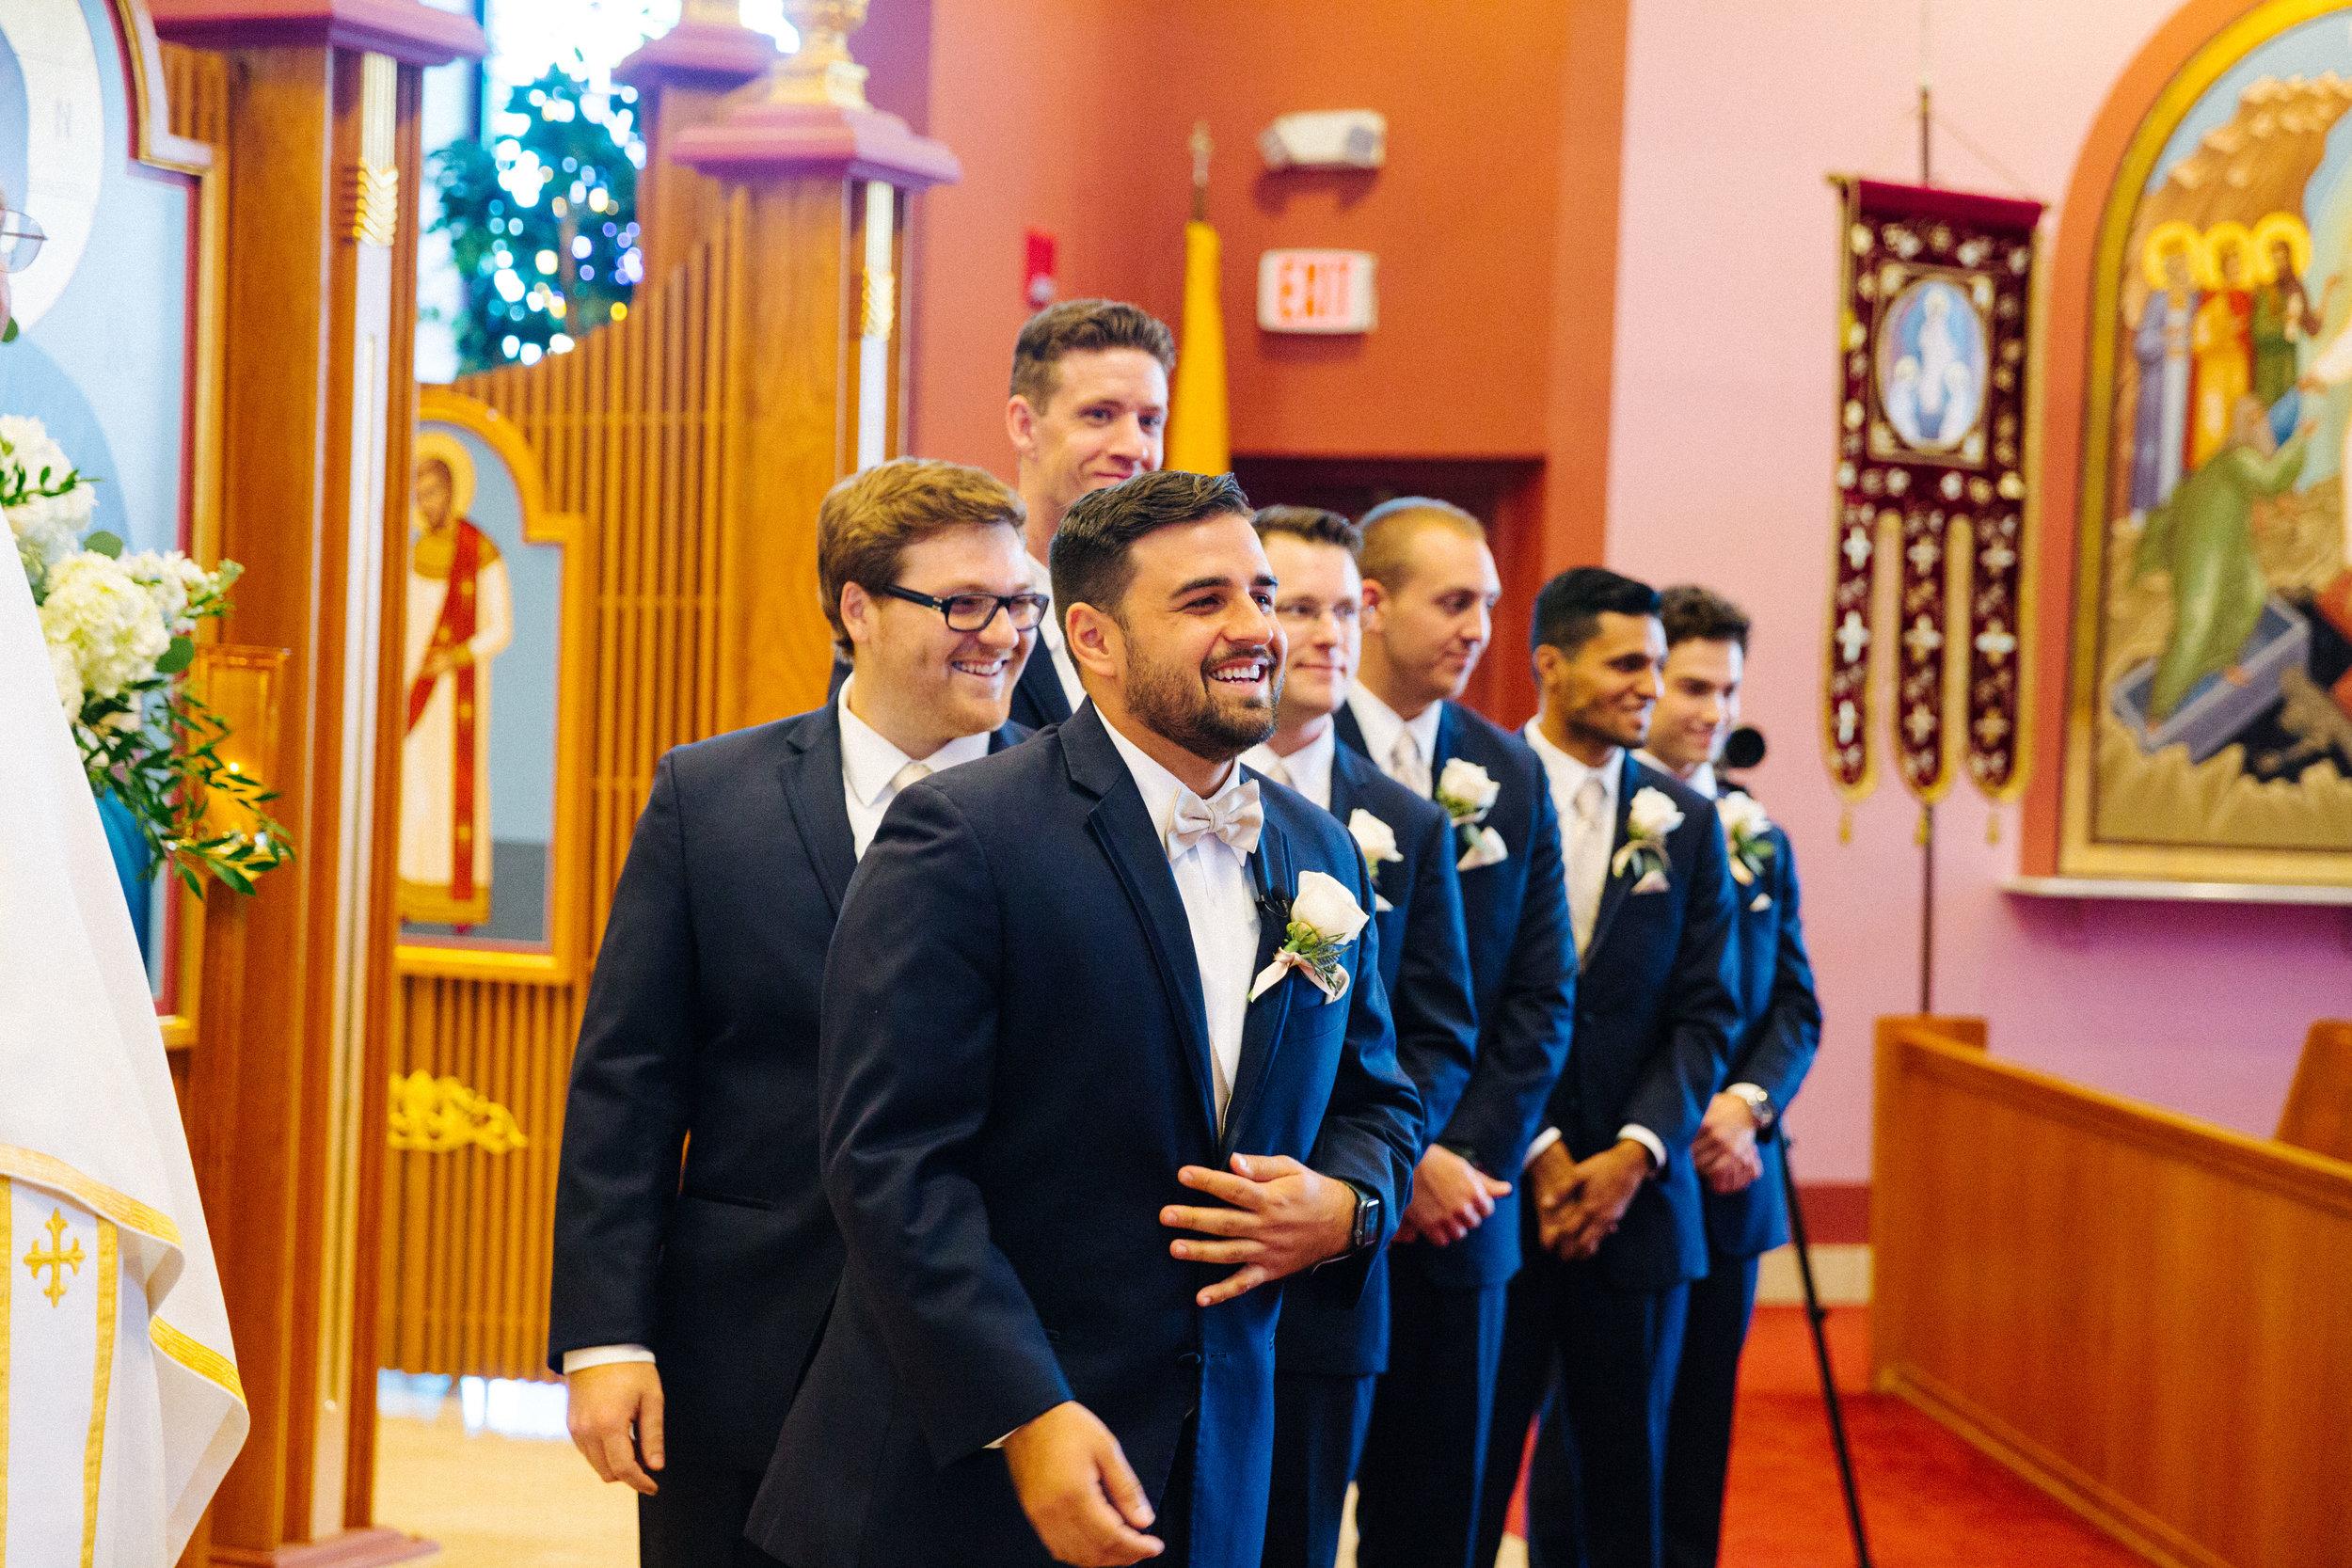 Ivan & Hannah - Ceremony - Jake & Katie Photography_070.jpg